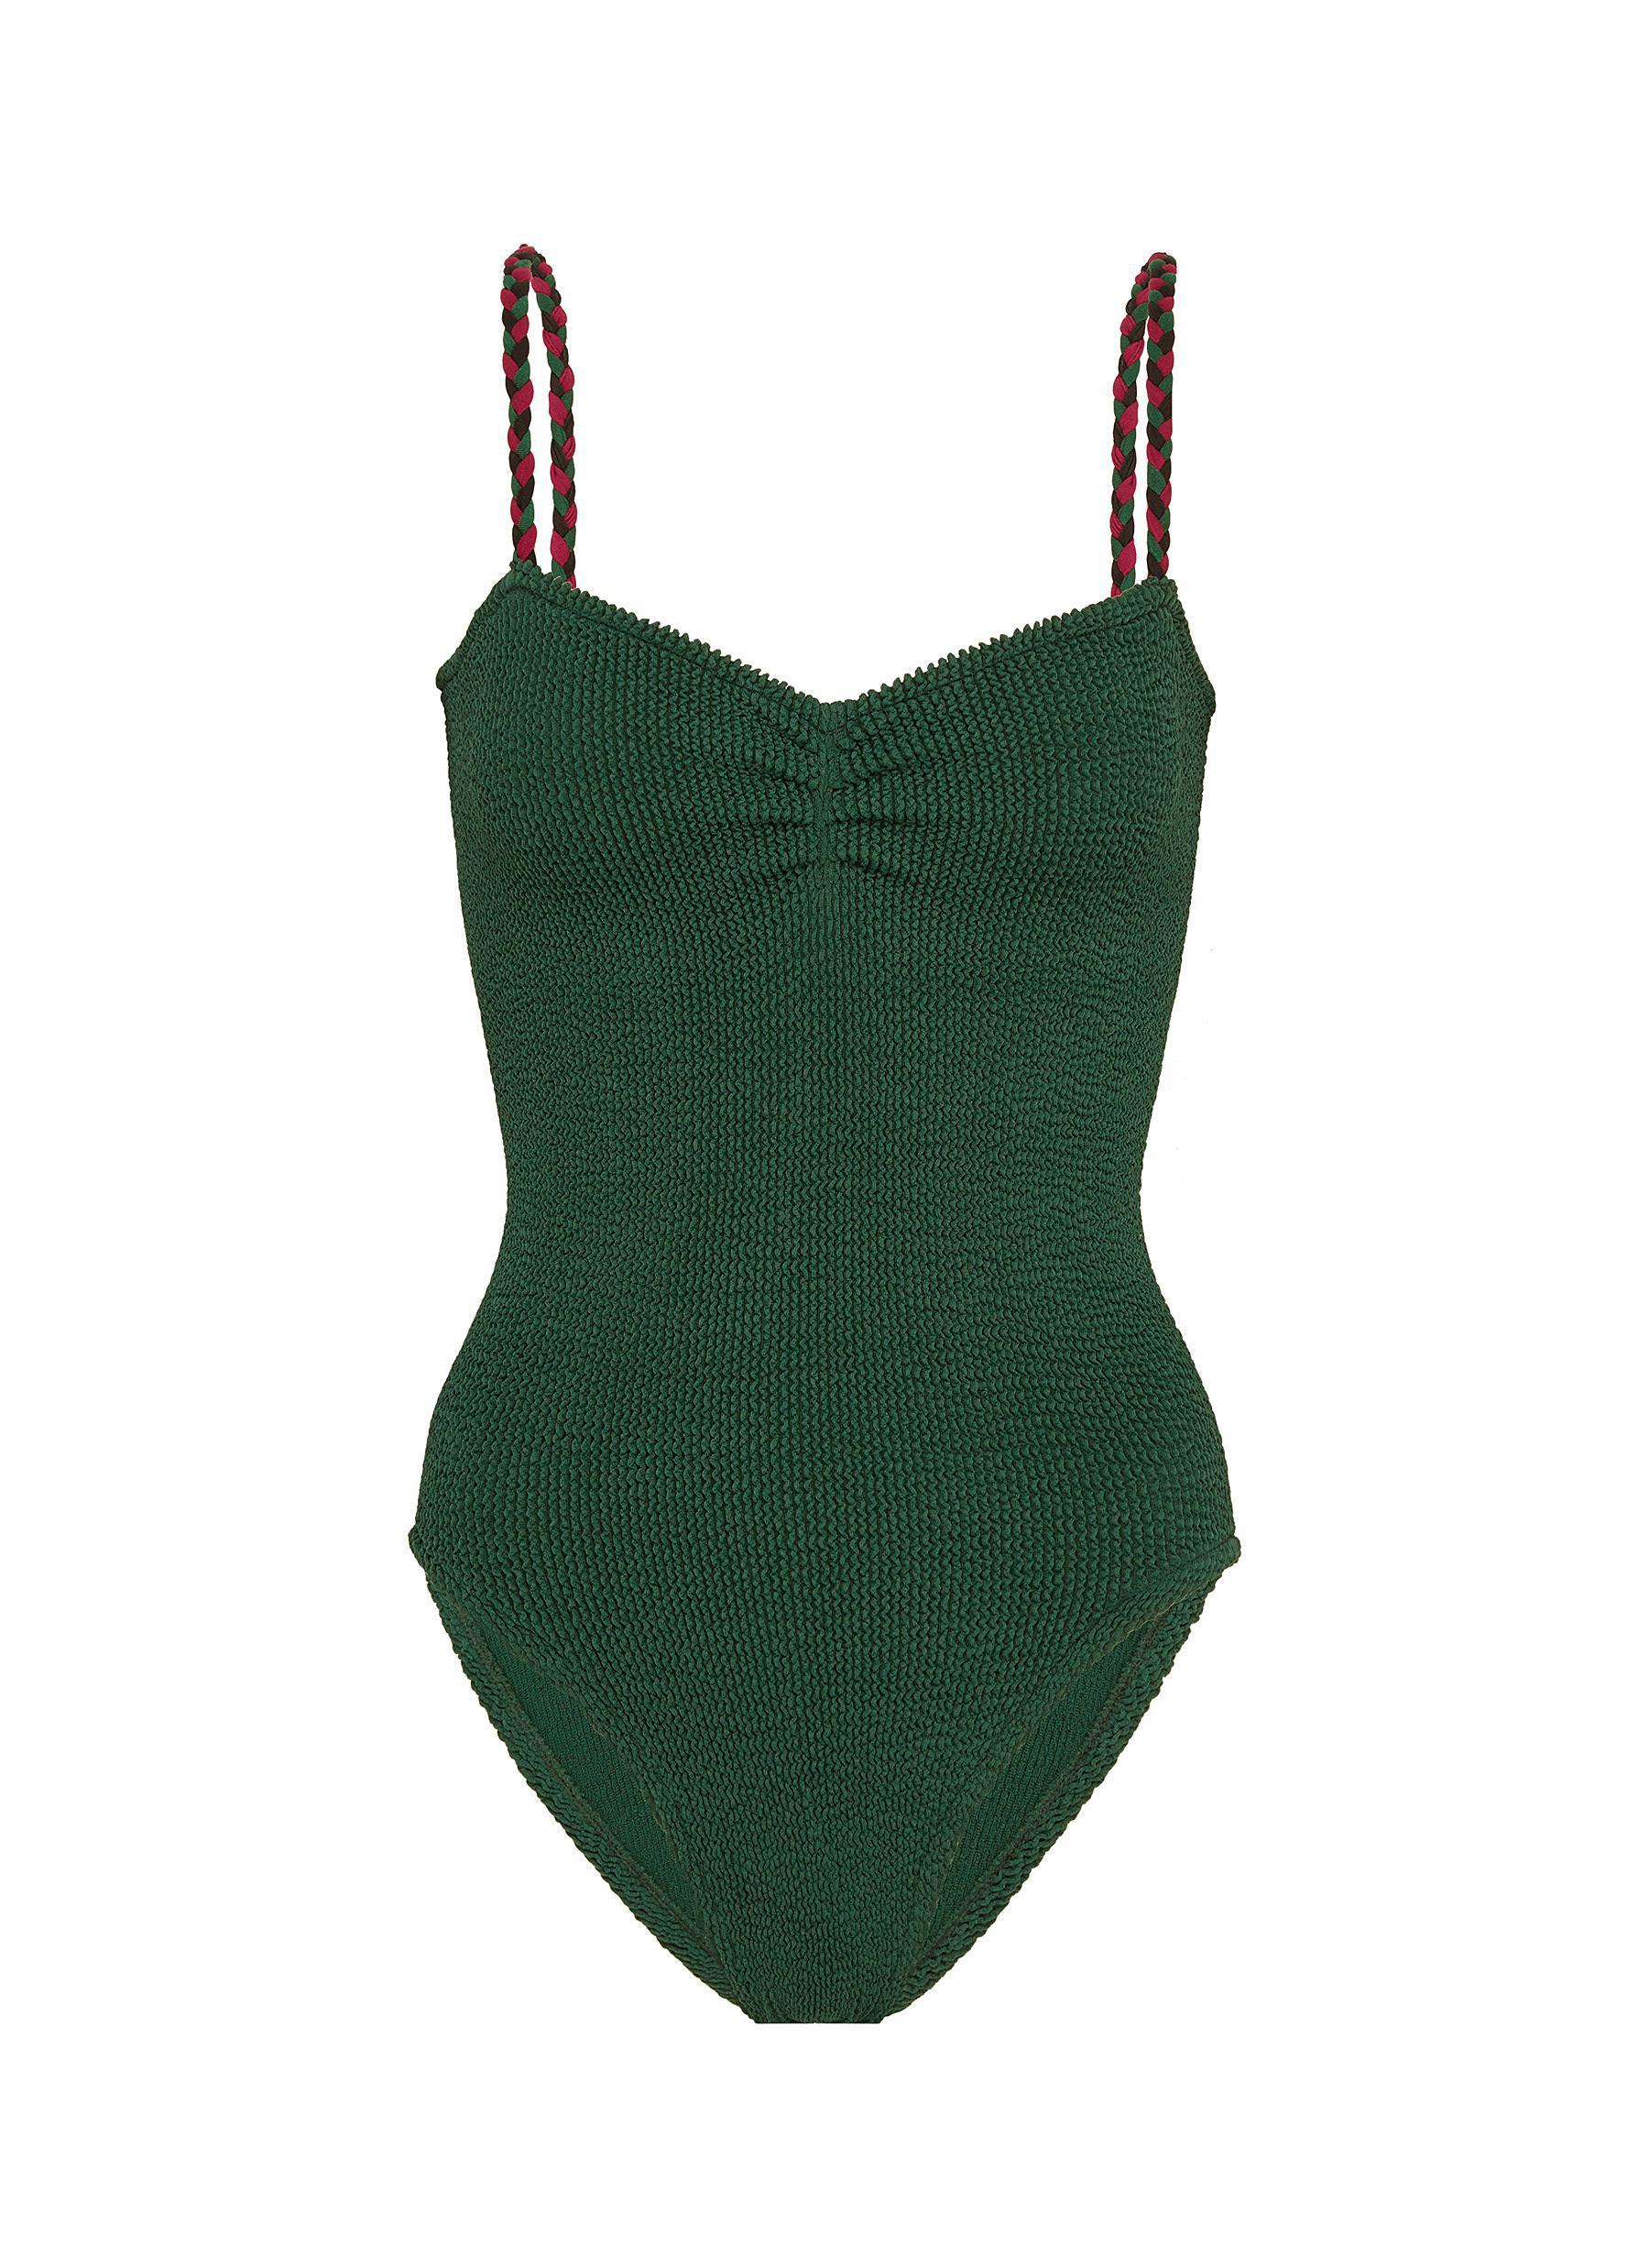 75d8088eff338 Hunza G 'trina' Braided Strap Seersucker One-piece Swimsuit in Green ...